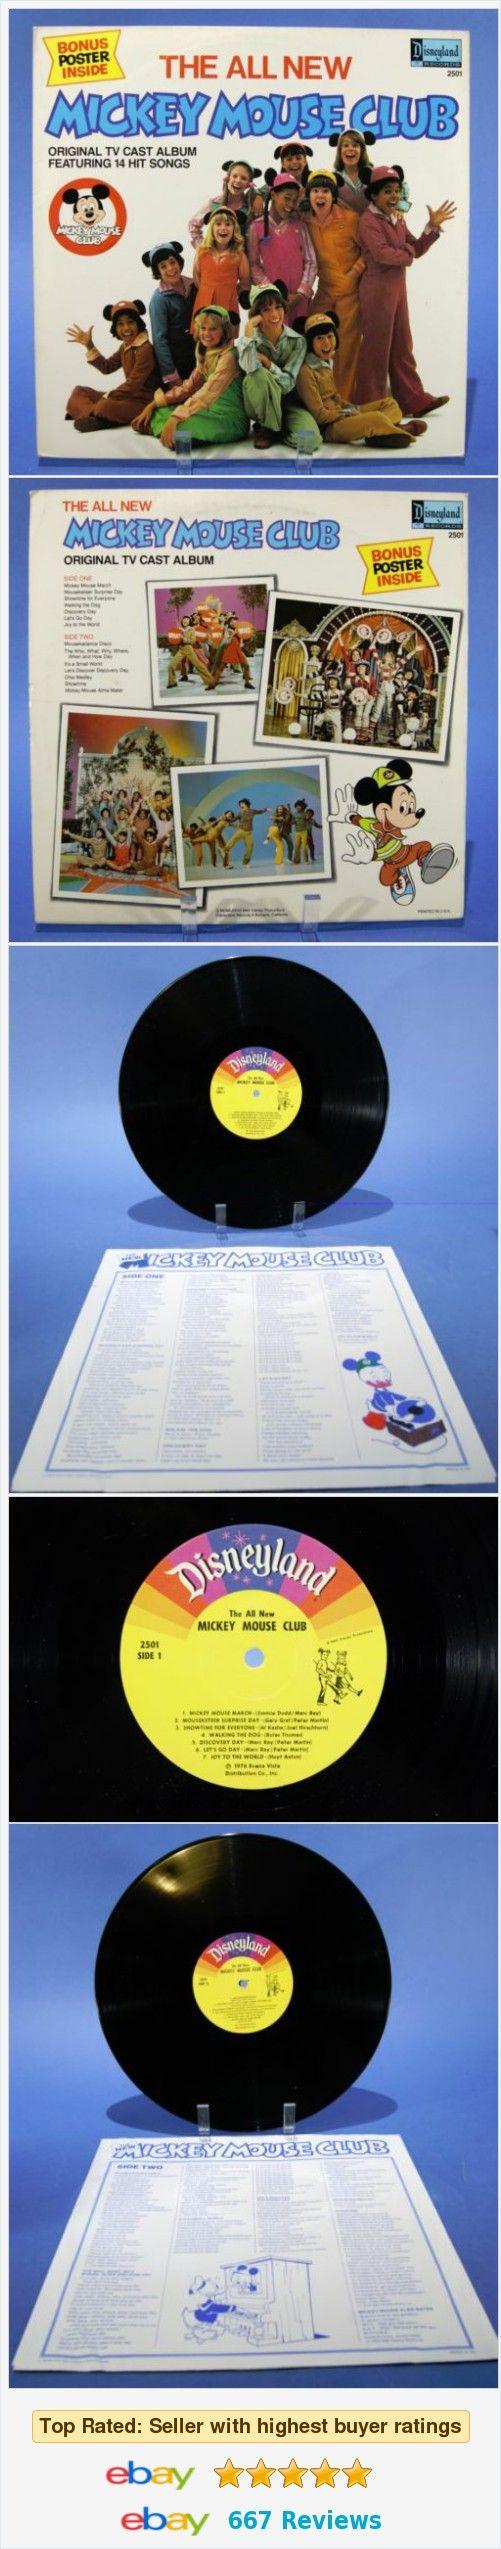 All New Mickey Mouse Club Vinyl Record Album LP Vintage Disneyland Records 1976  | eBay